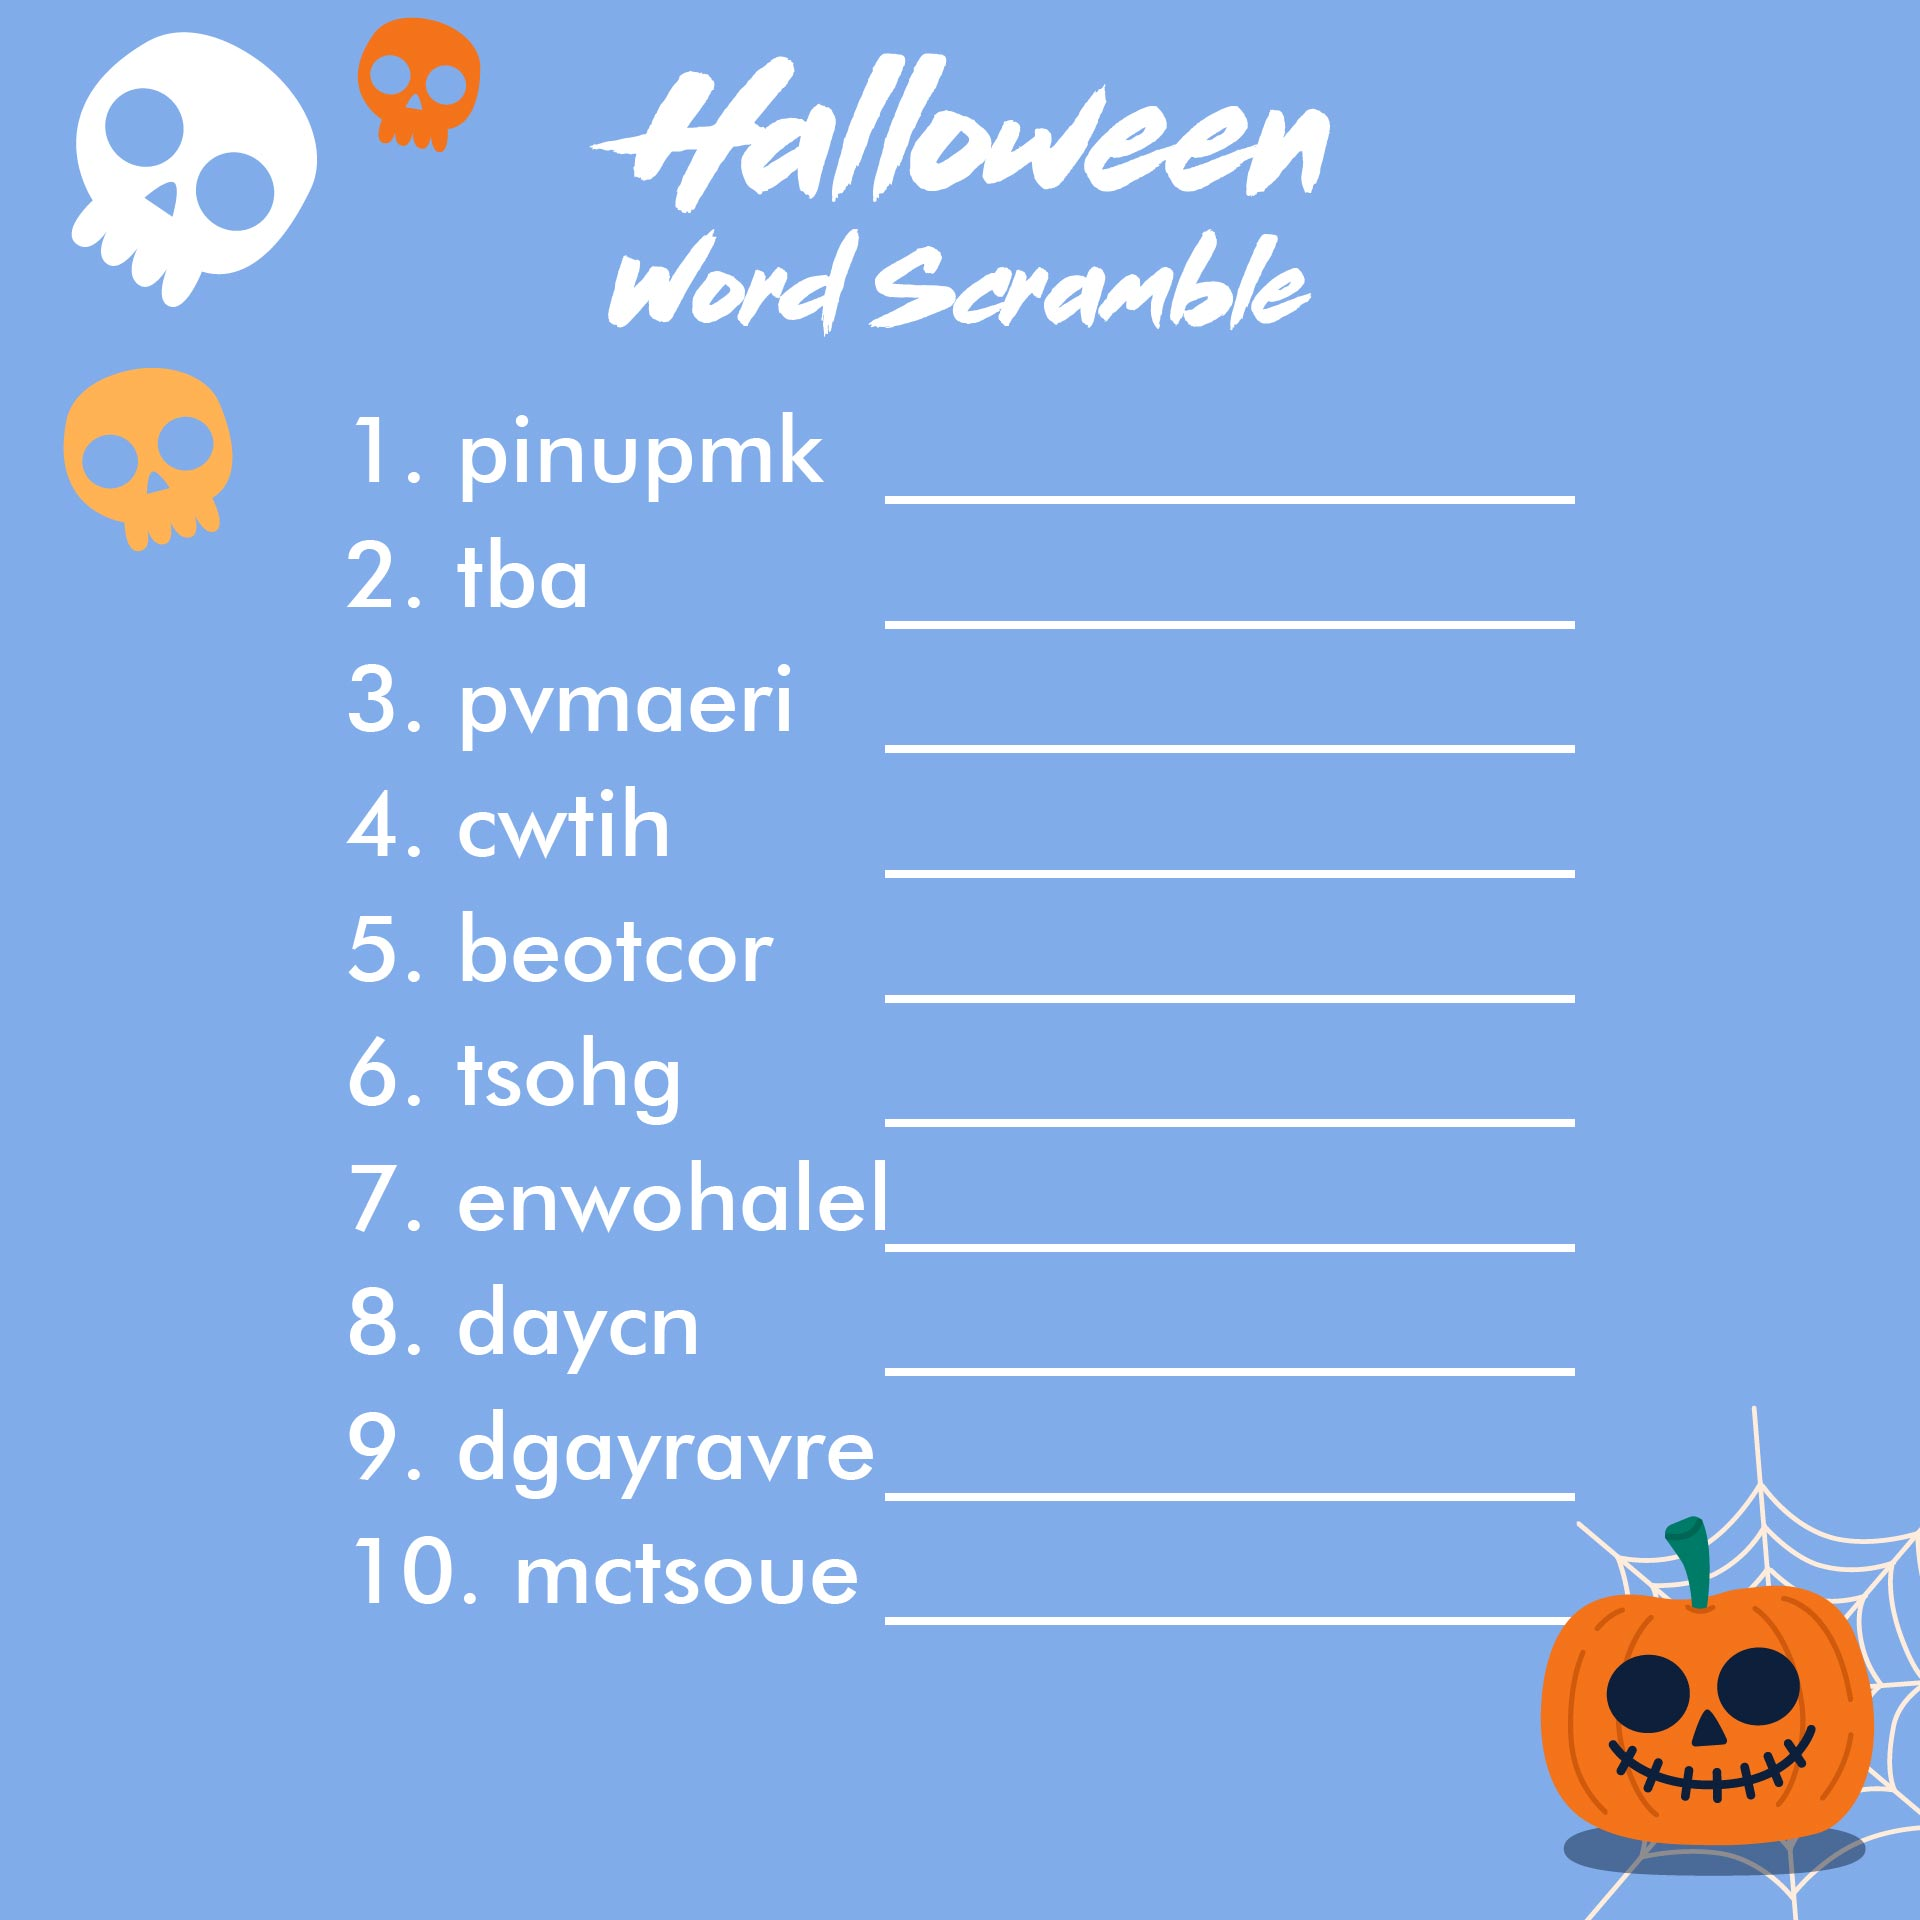 Halloween Word Scramble Printable